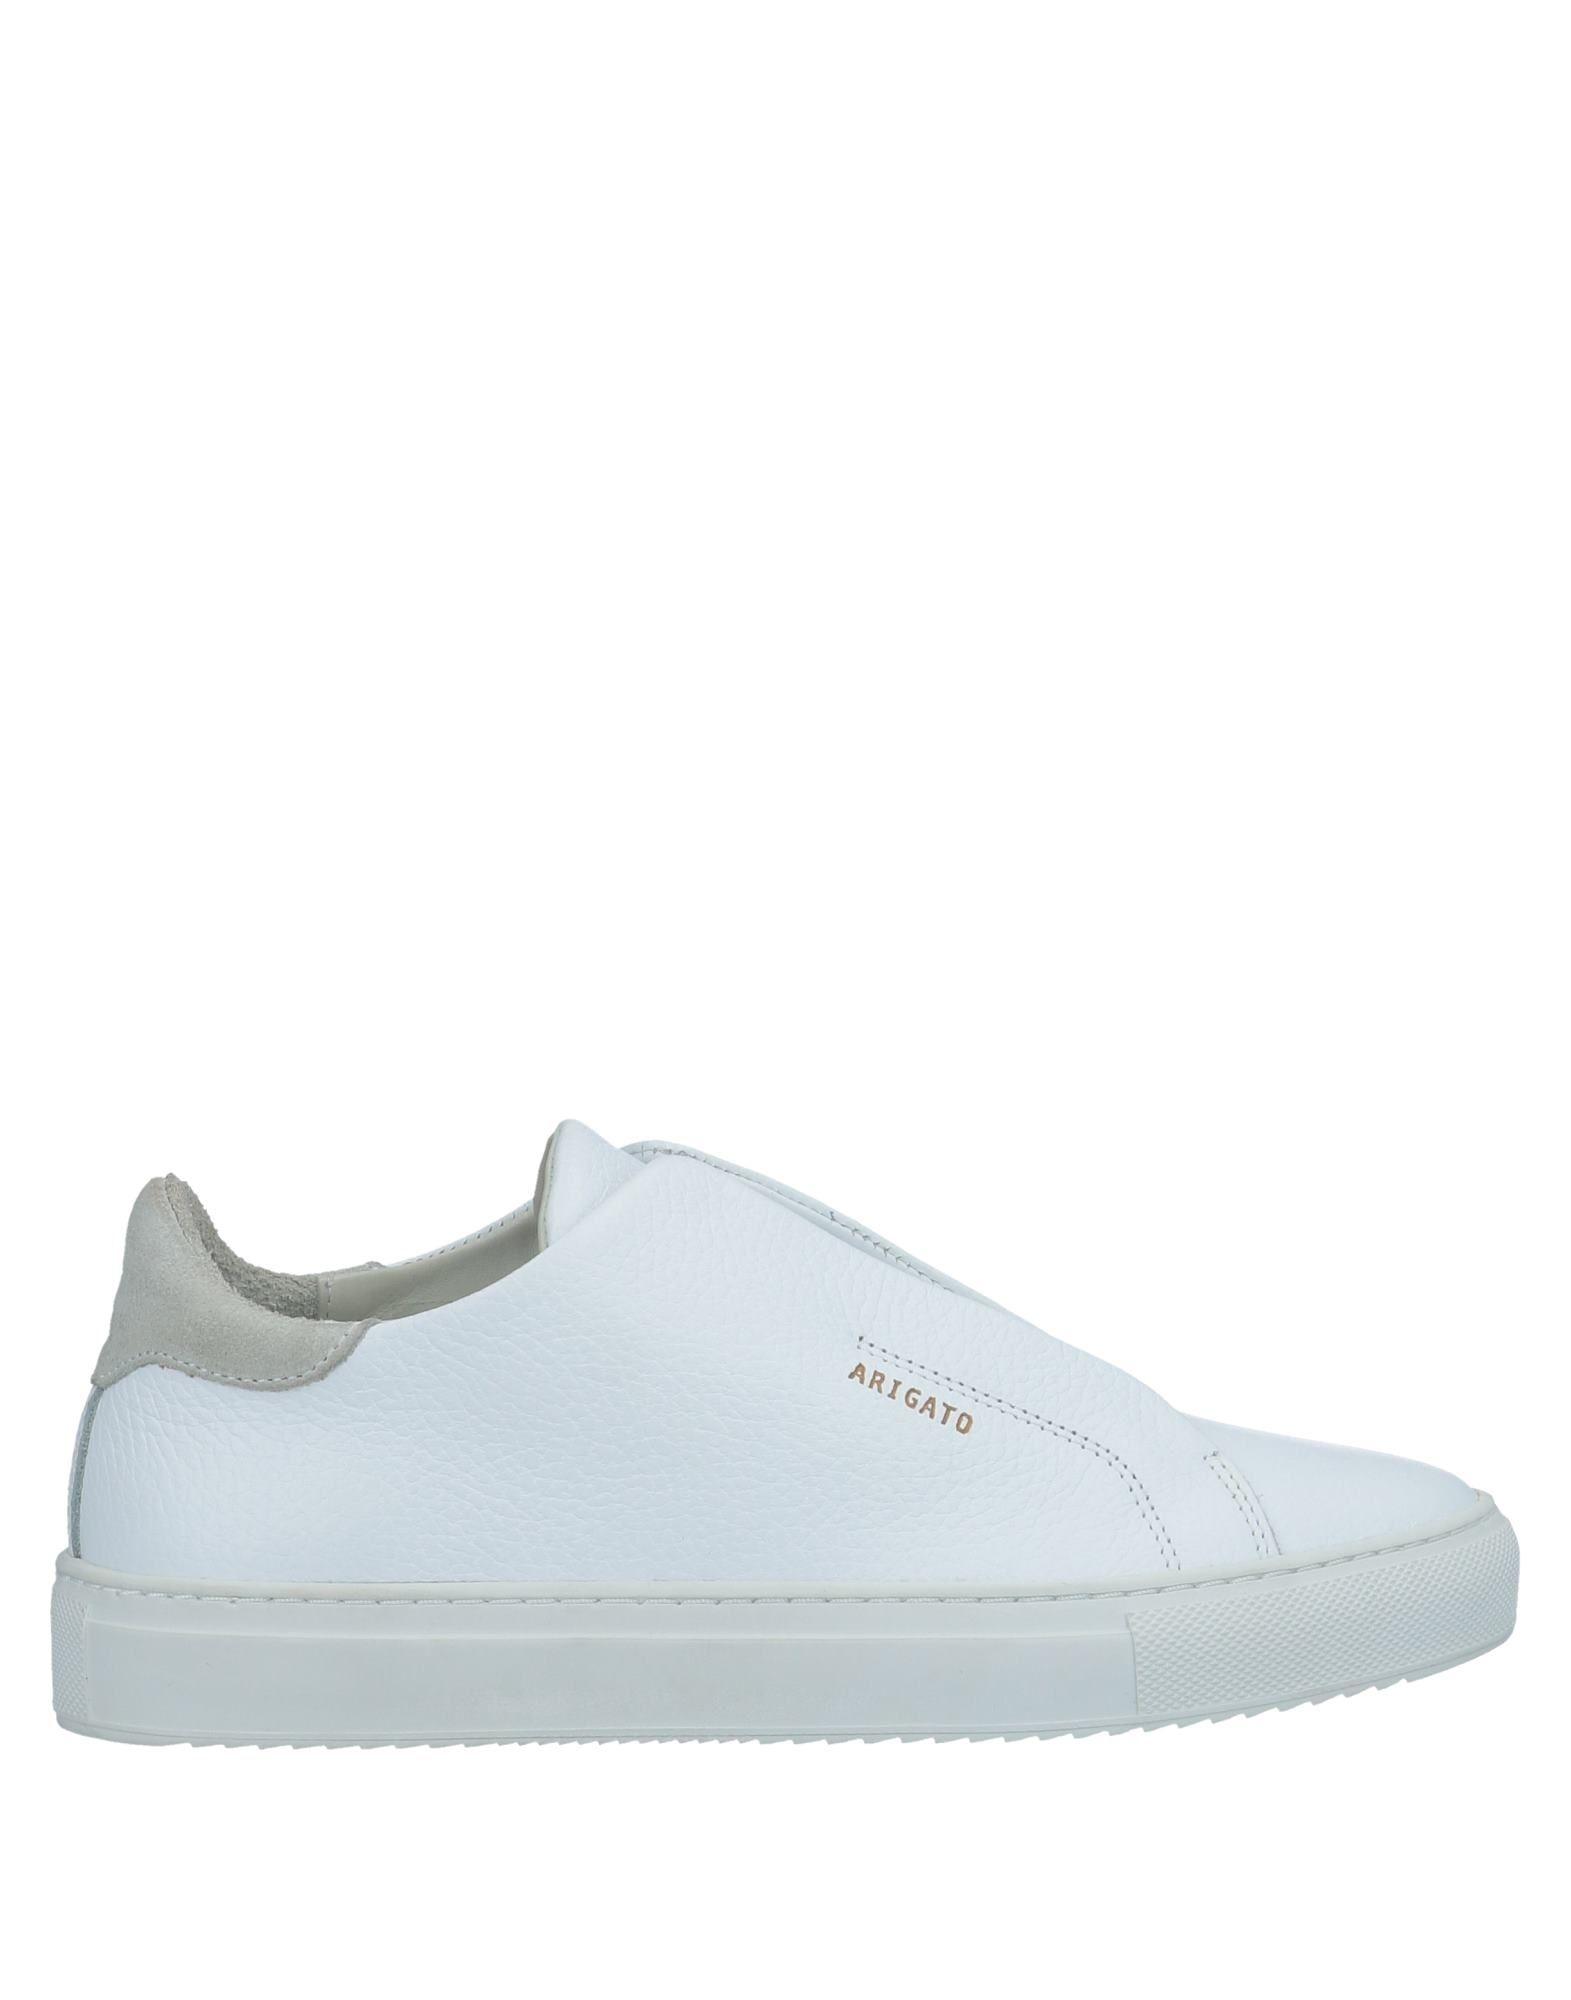 Qualität 11558057rp Axel Arigato Damen Sneakers Gute kZiOTwPXul